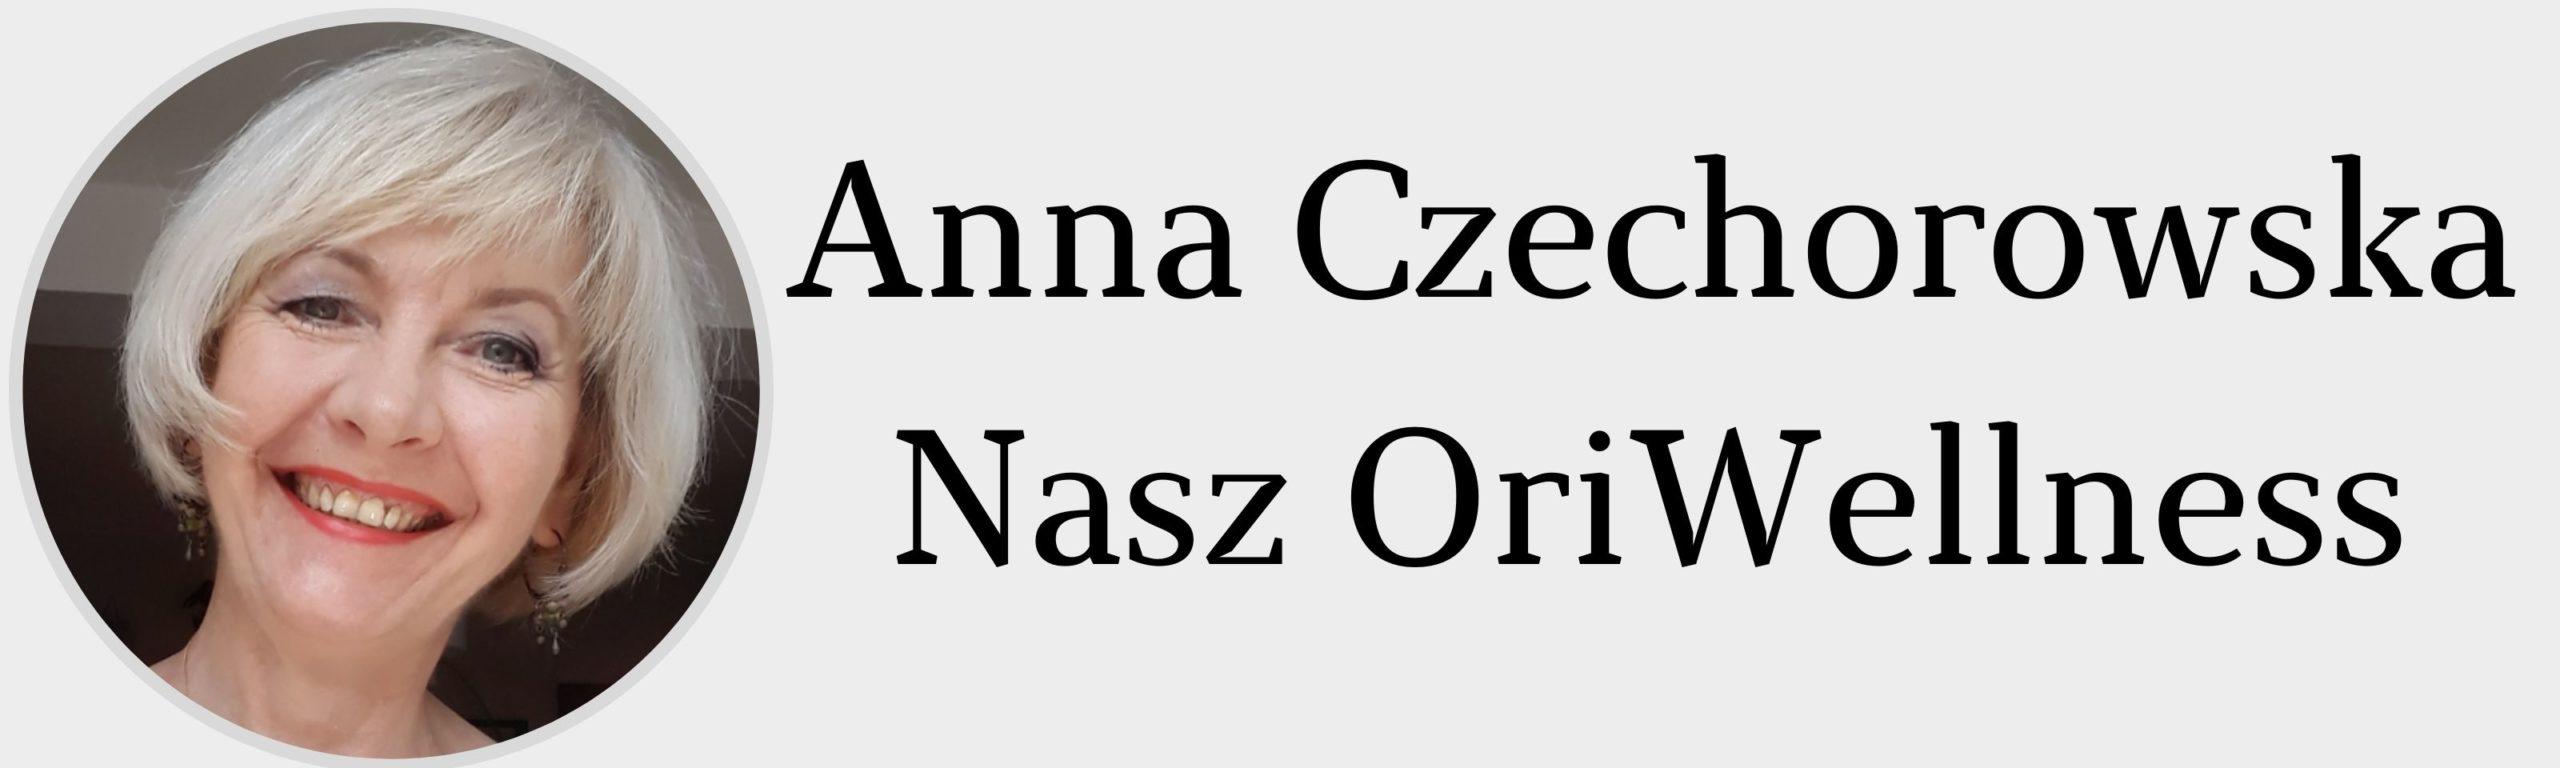 Anna Czechorowska